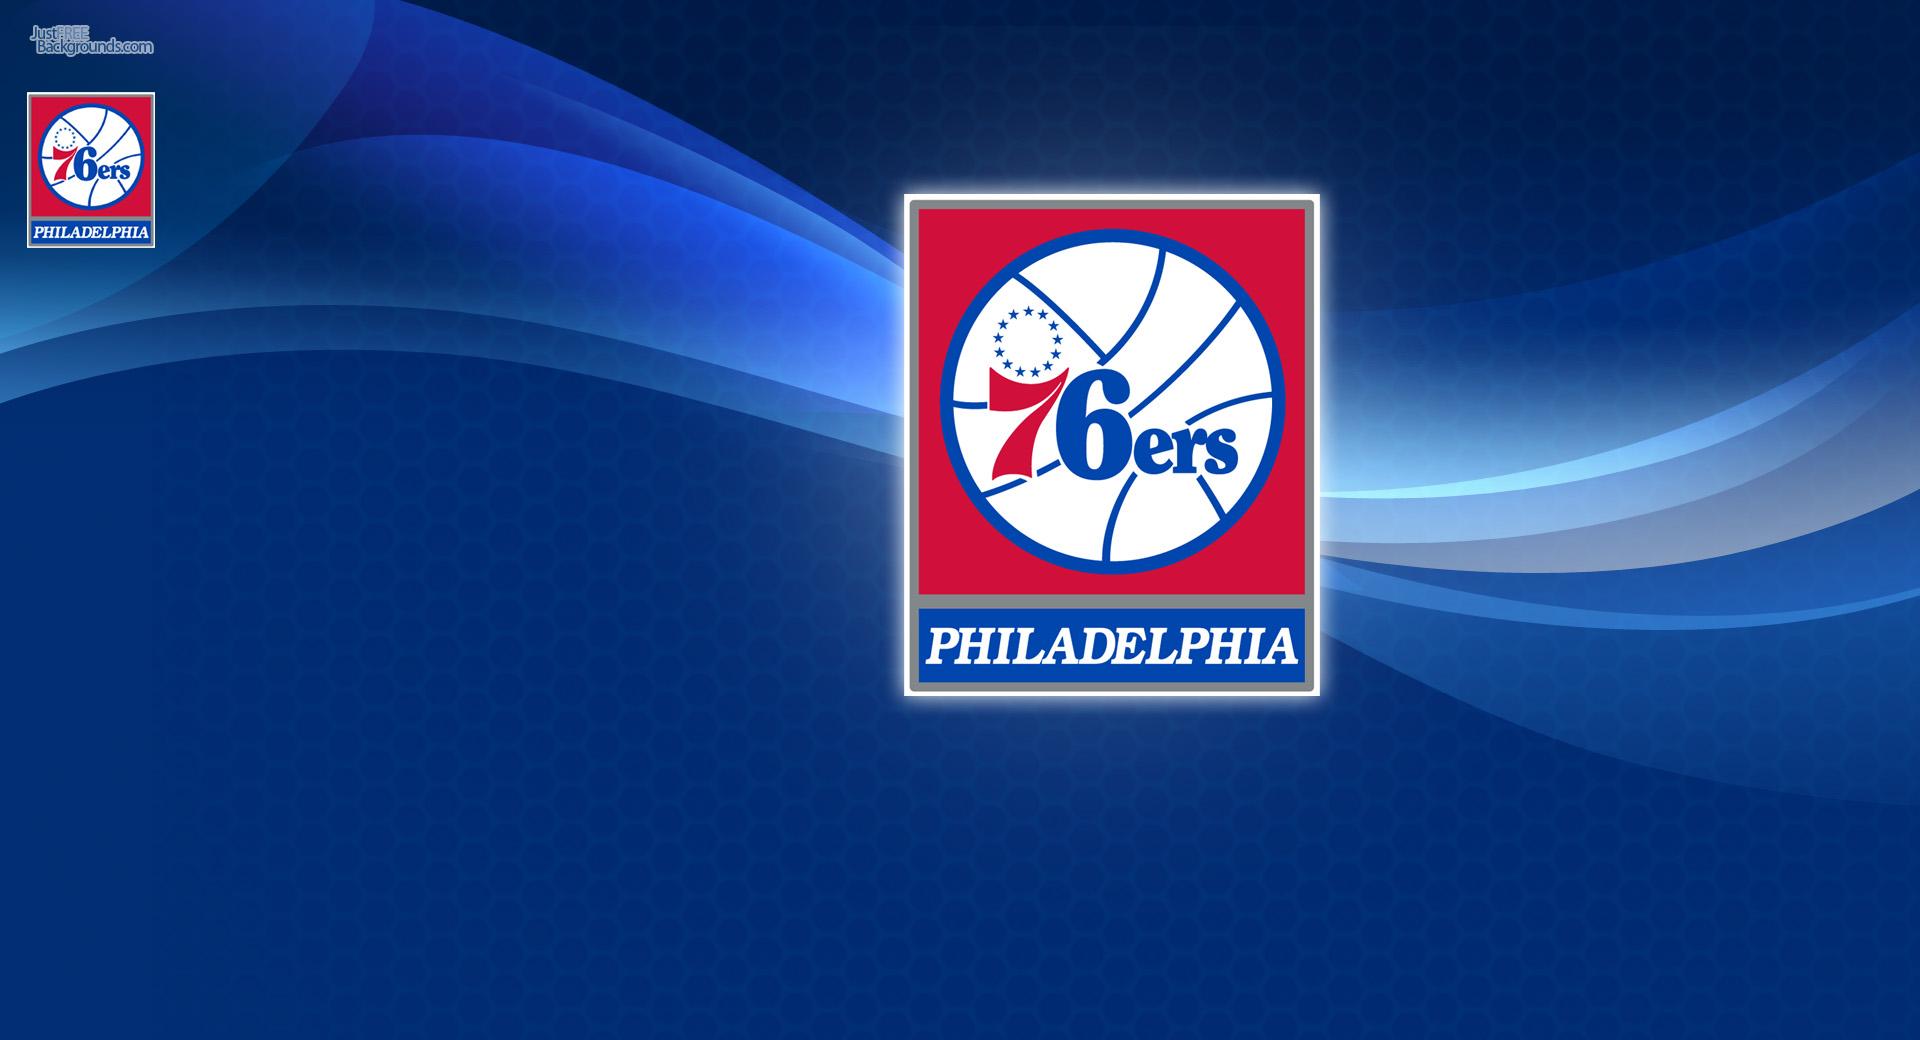 philadelphia 76ers nba basketball 2 wallpaper